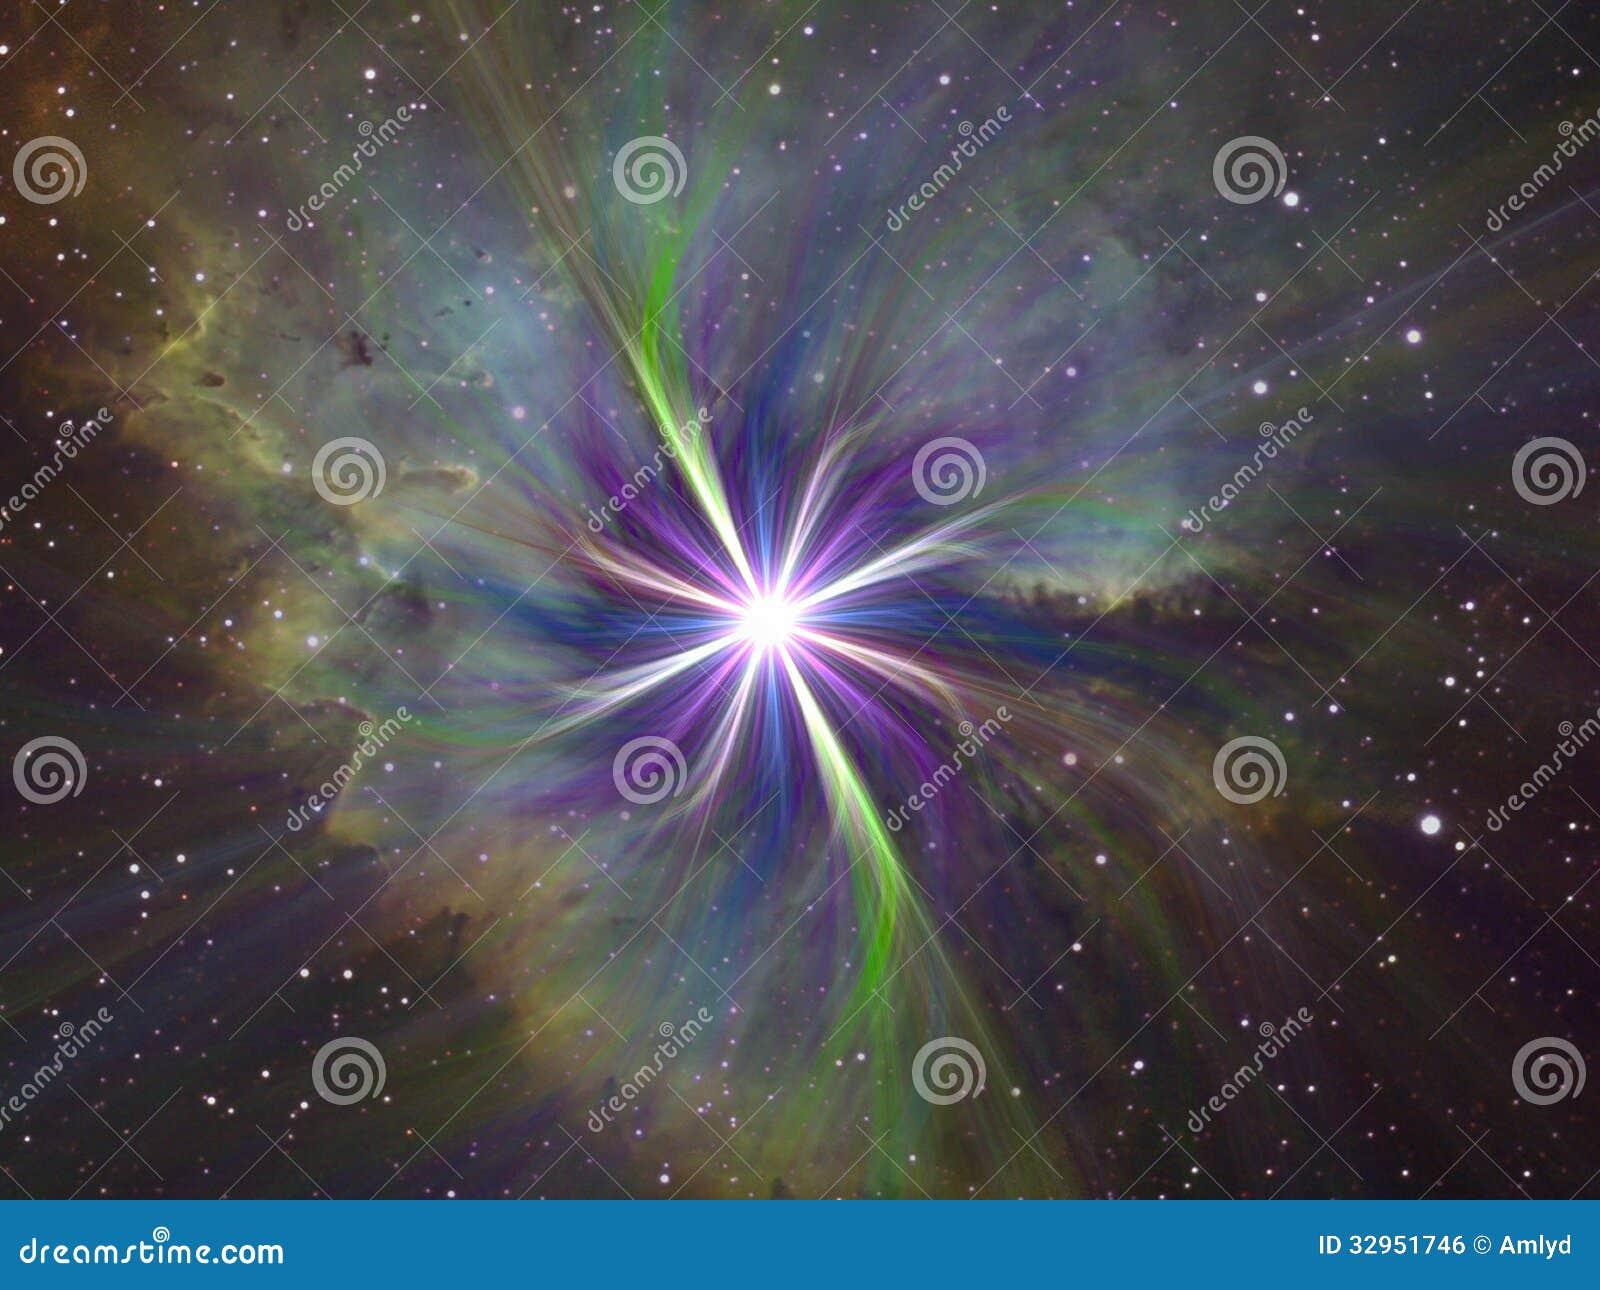 Supernova Royalty Free Stock Image - Image: 32951746